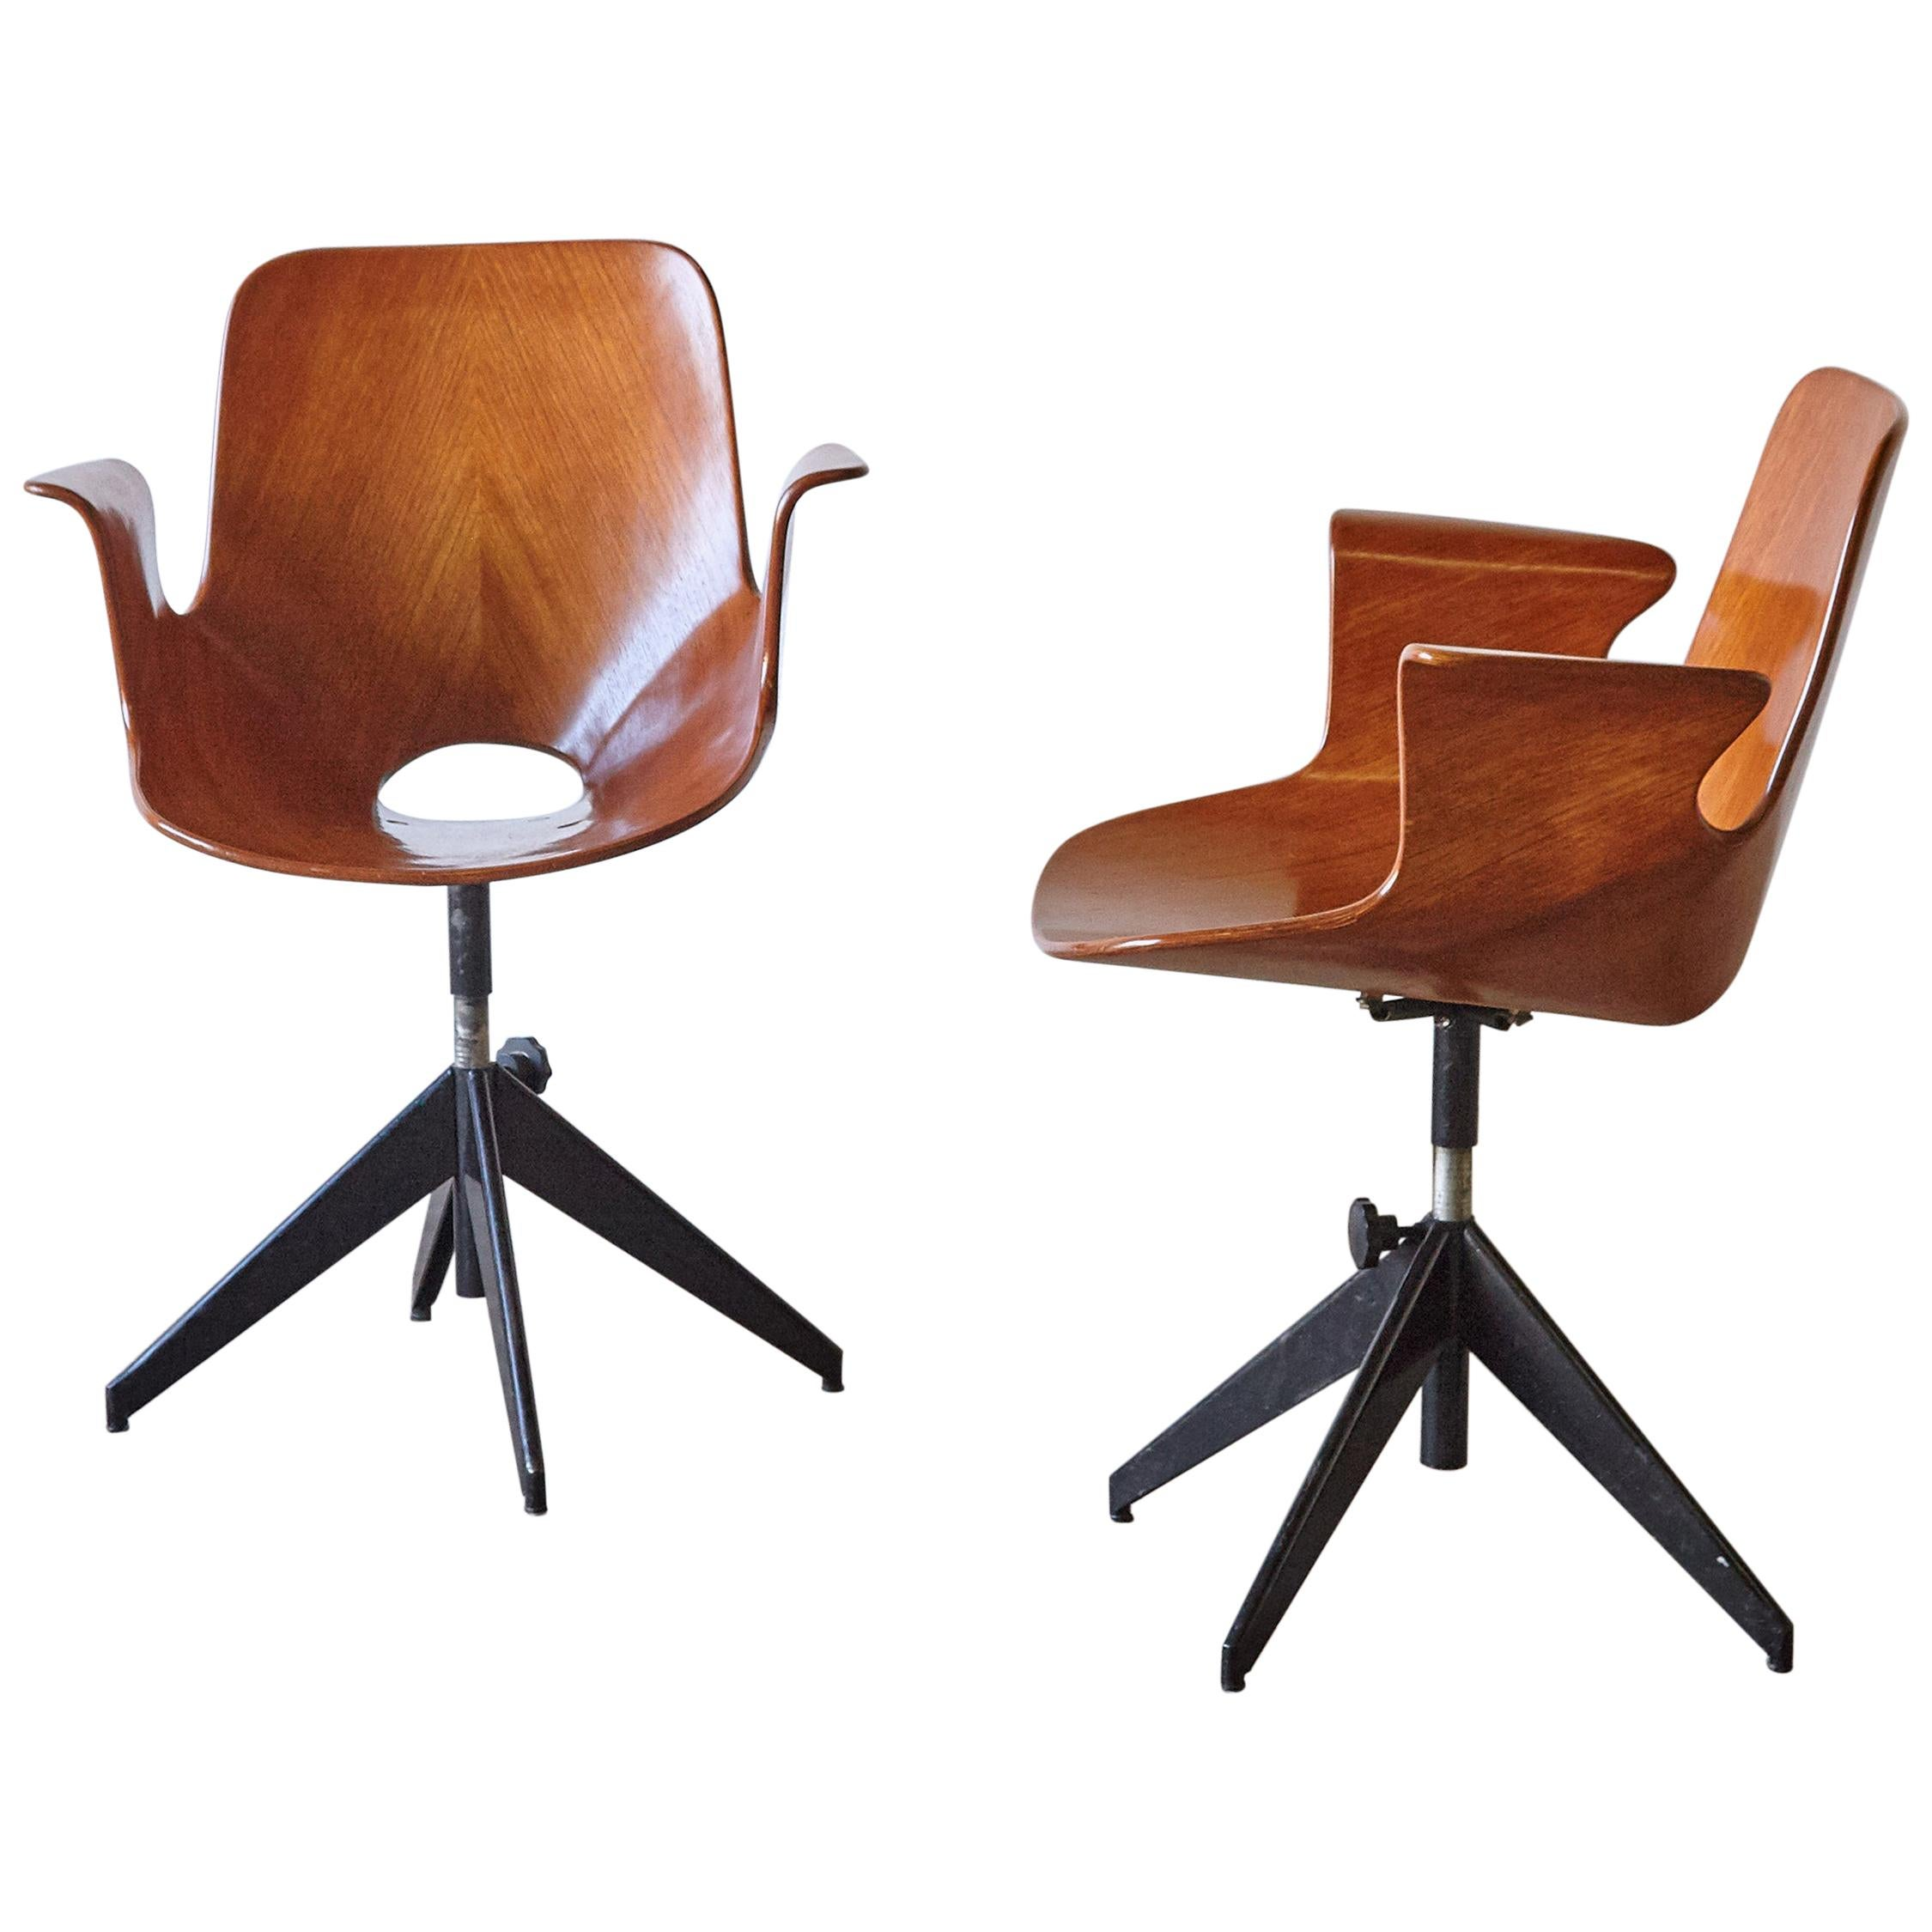 Pair of Vittorio Nobili for Fratelli Tagliabue Medea Desk Chairs, Italy, 1950s